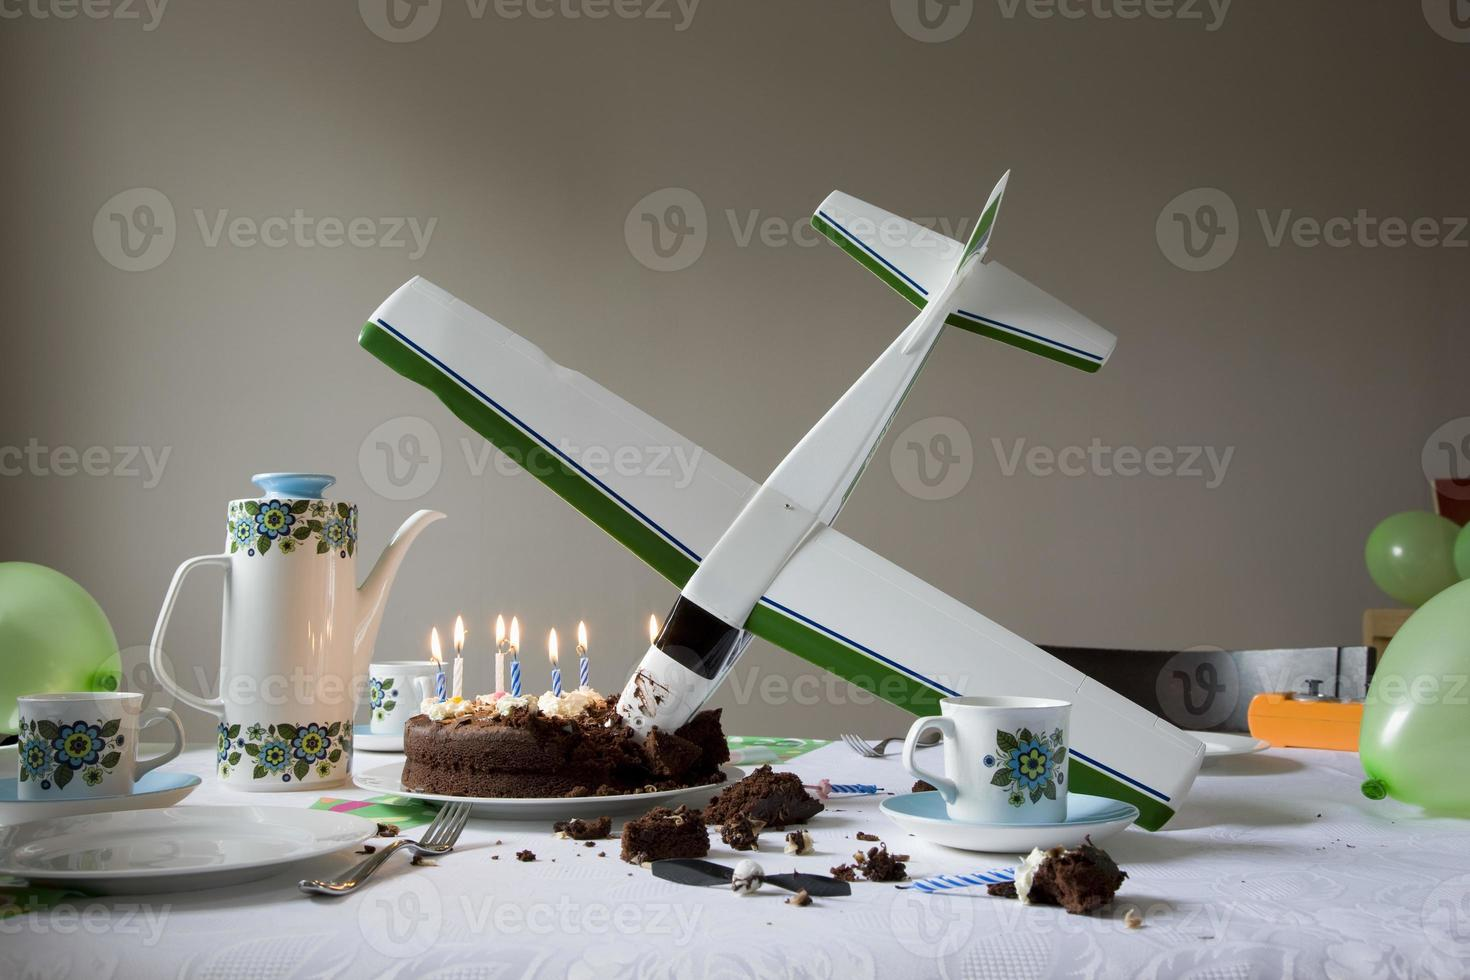 Modellflugzeug in Geburtstagstorte foto